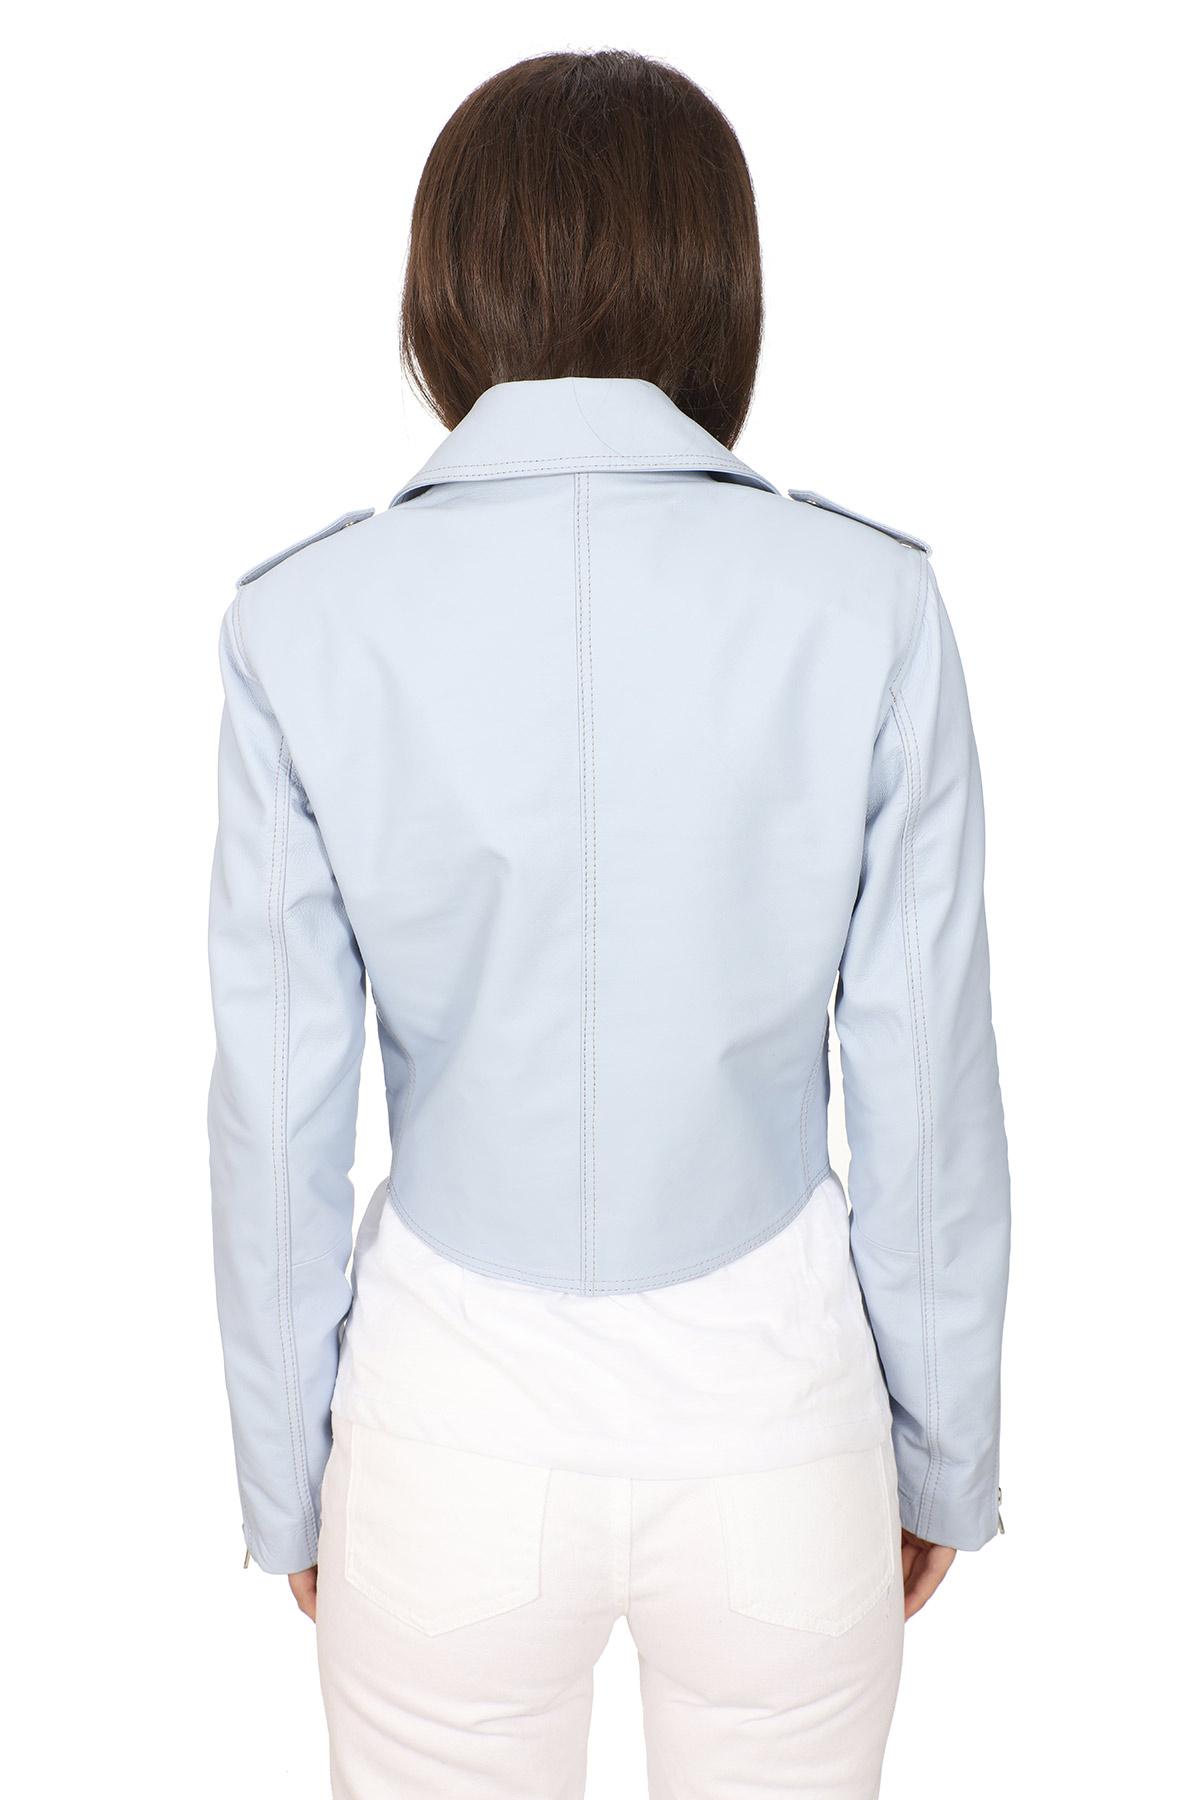 Light Blue Leather Jacket Womens